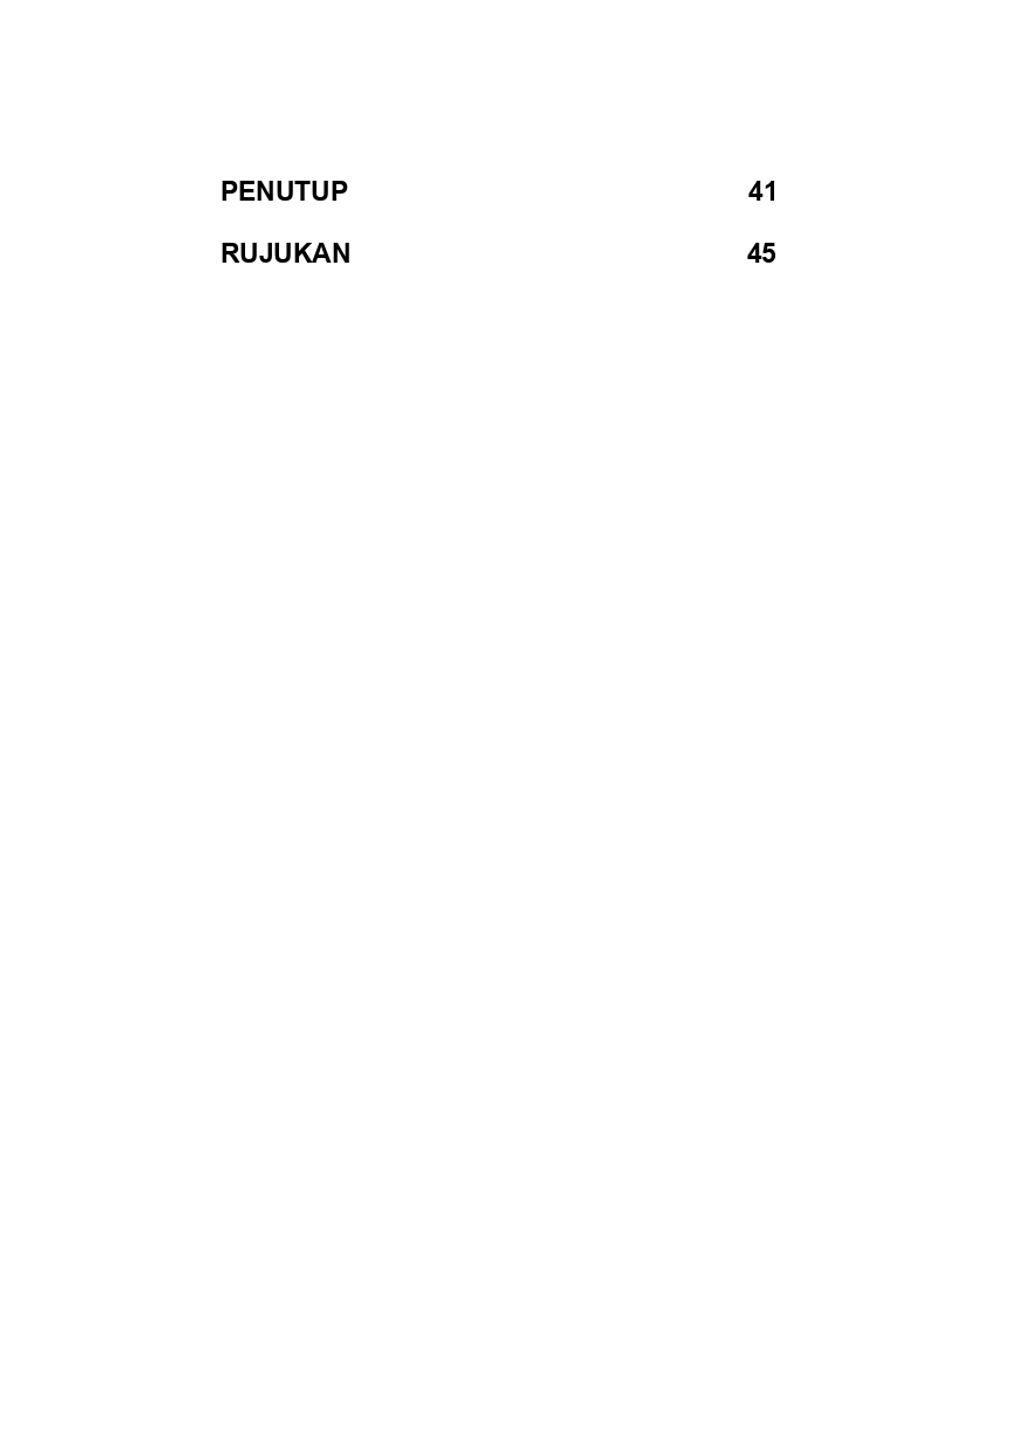 Kandungan Wanita & Faraid p2_page-0001.jpg